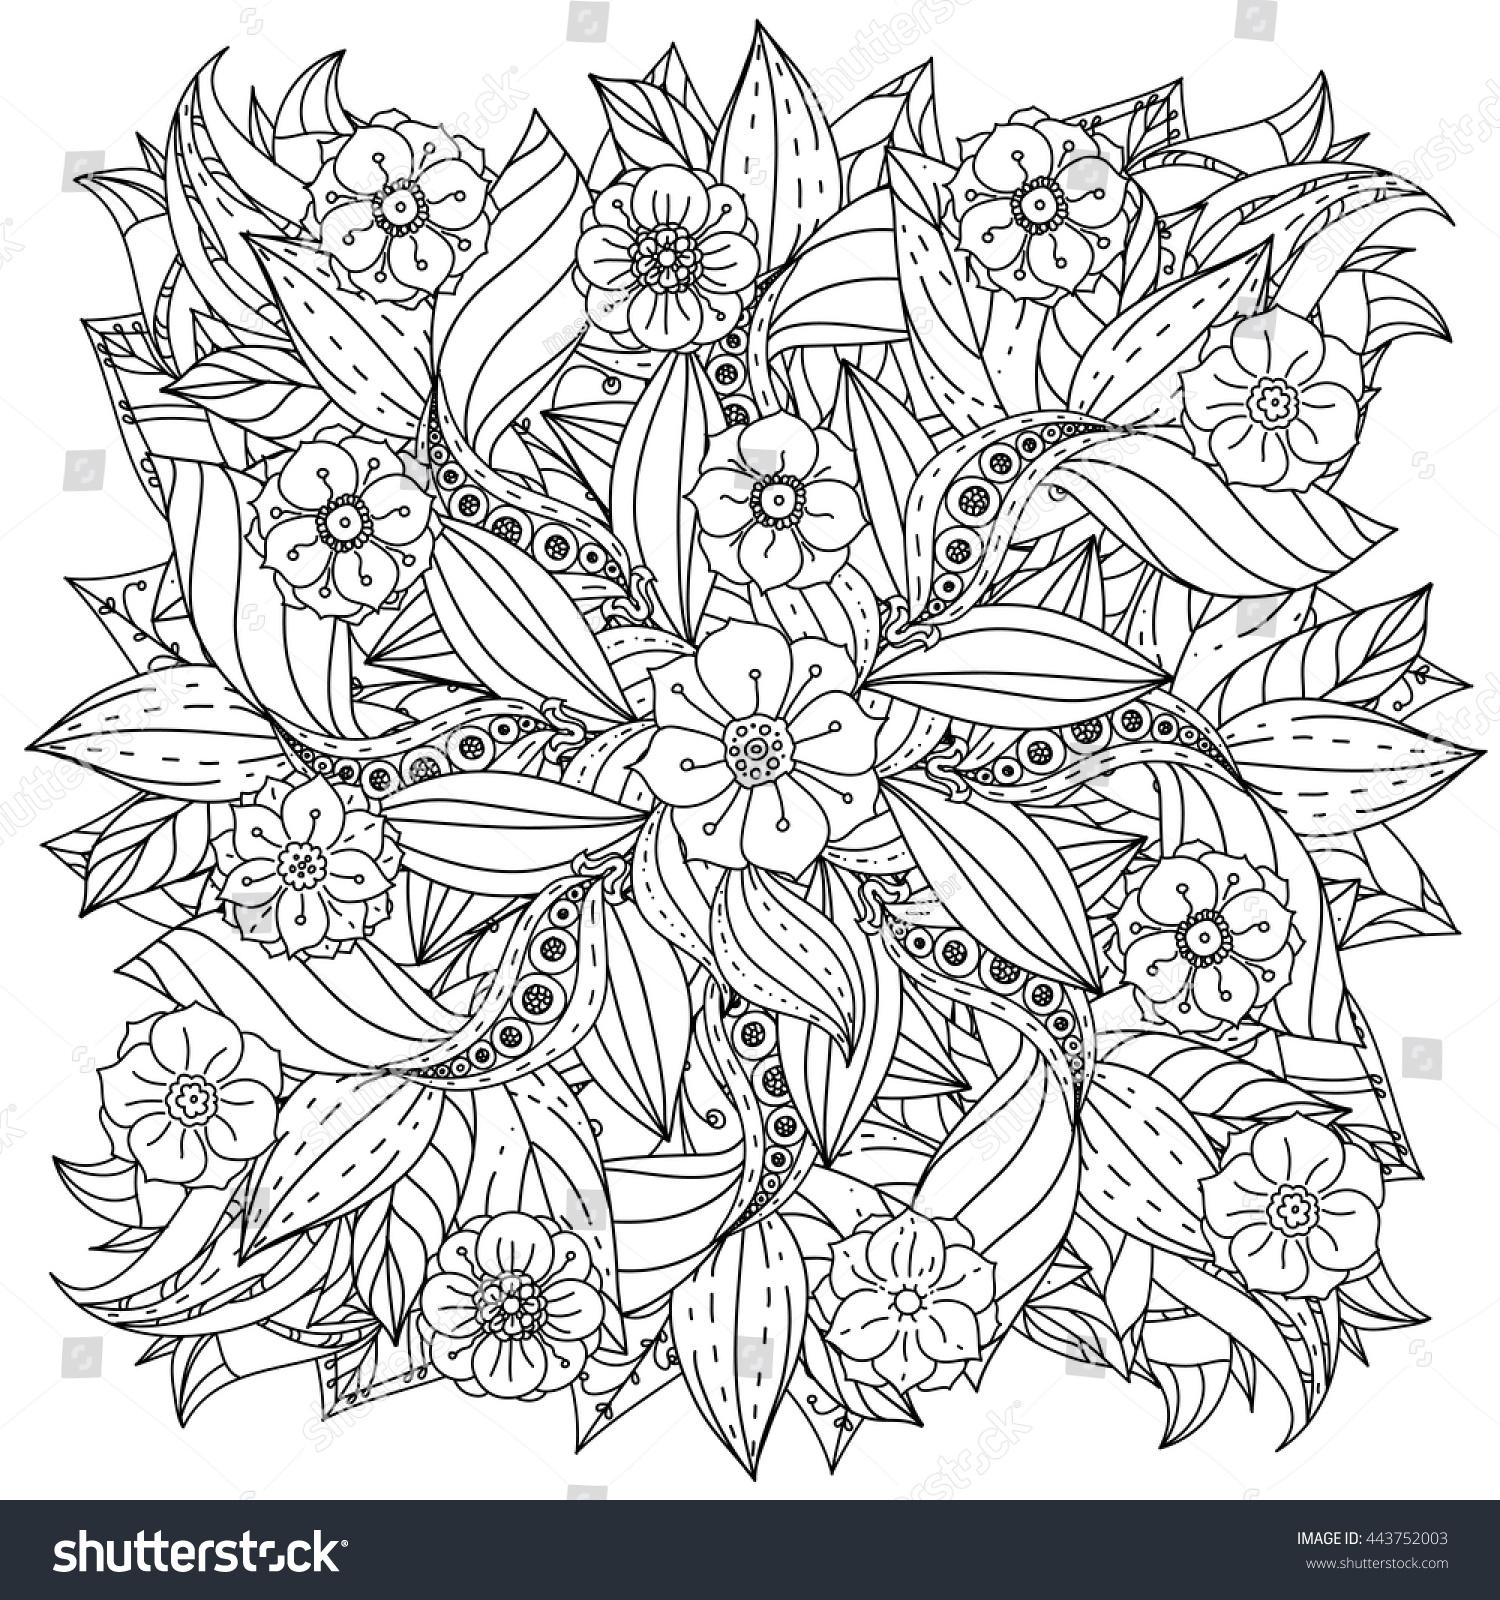 Ze zen inspiration coloring book -